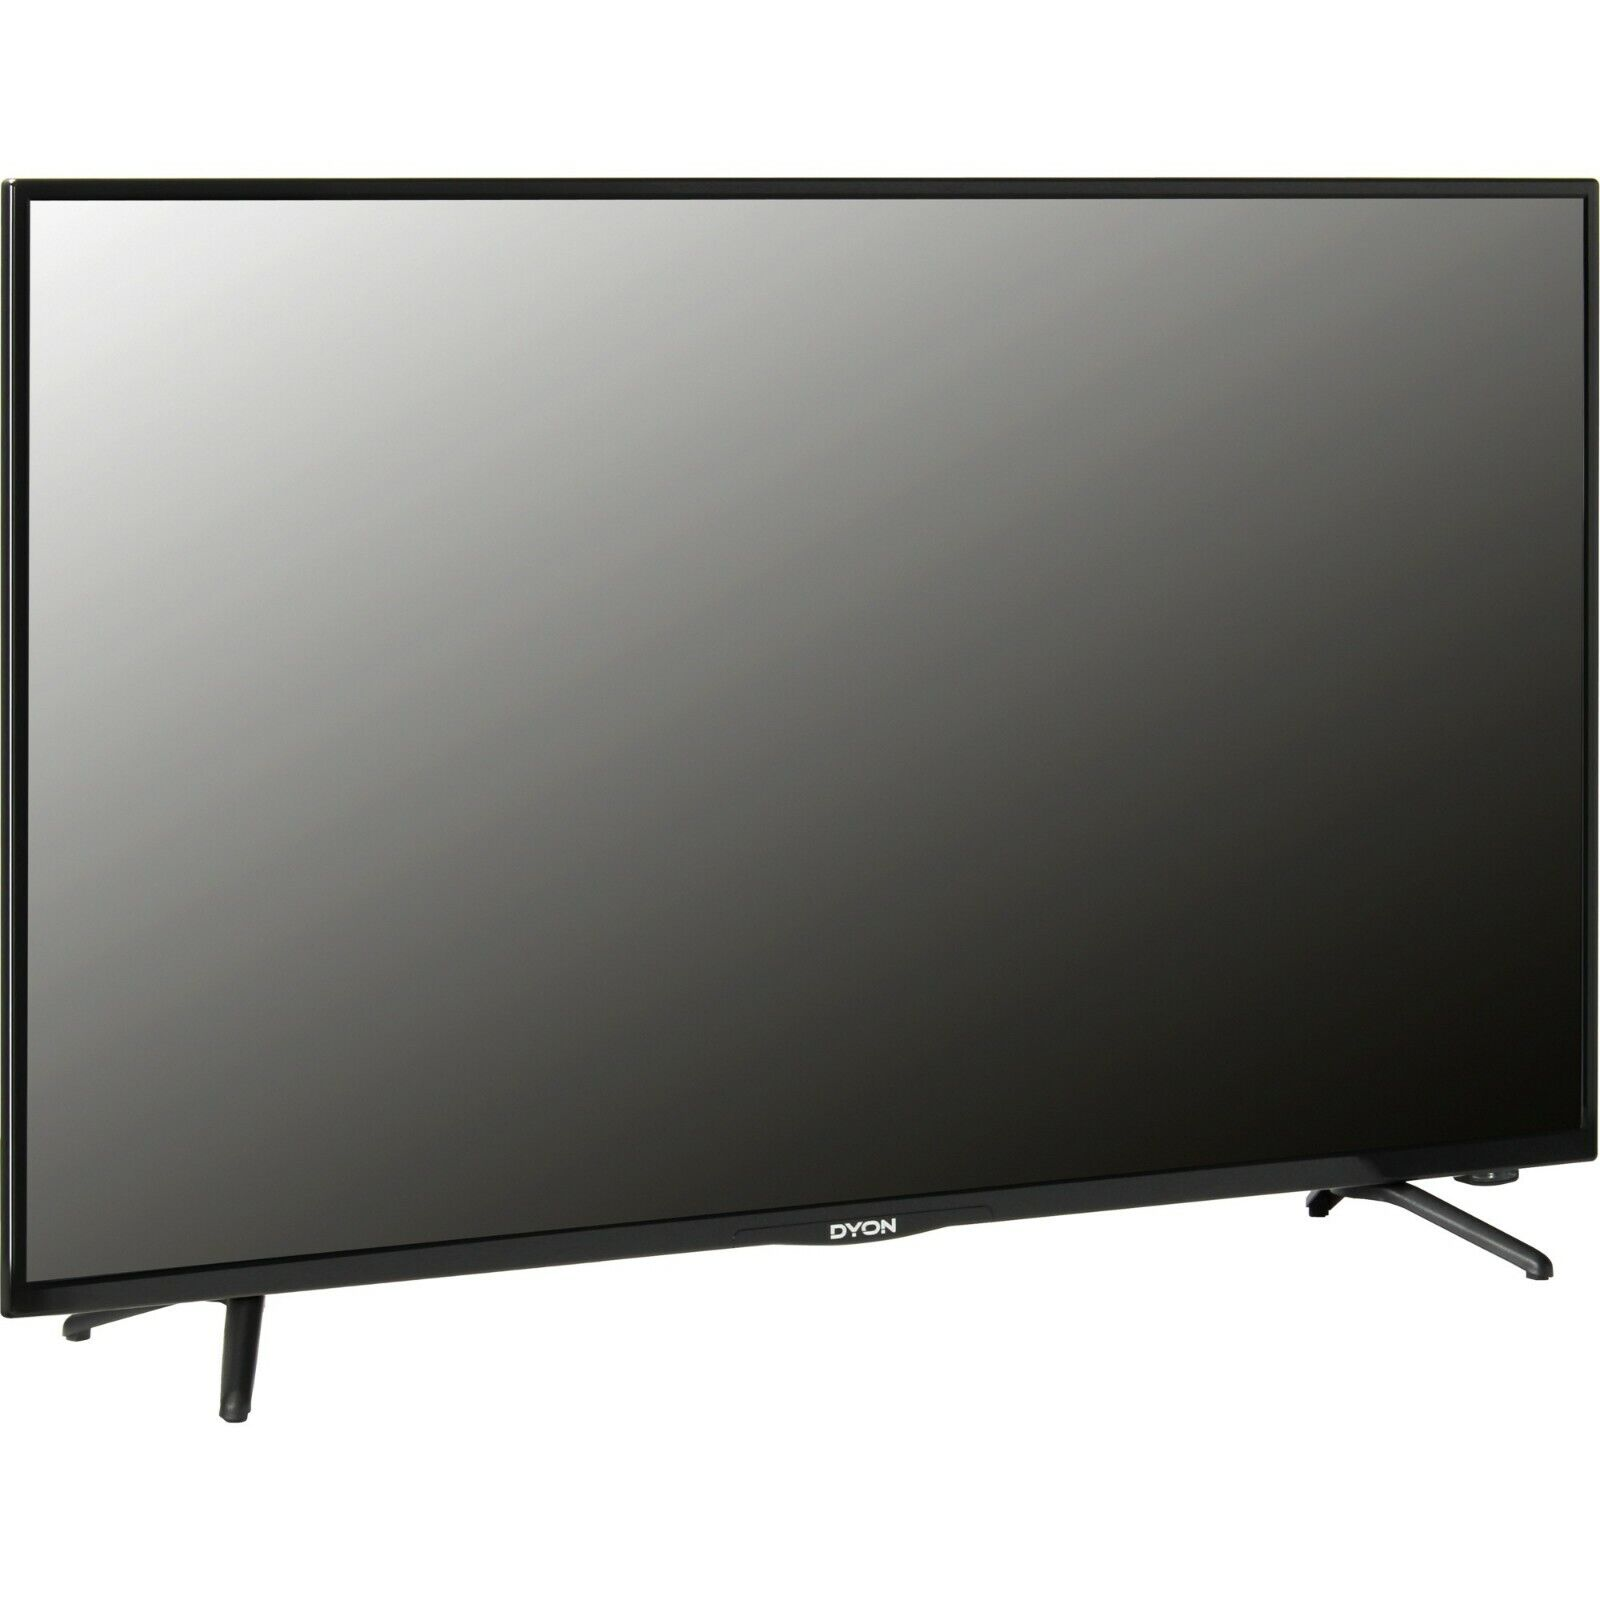 DYON LIVE 40 Pro-X 40 Zoll Full-HD LED Fernseher Triple Tuner